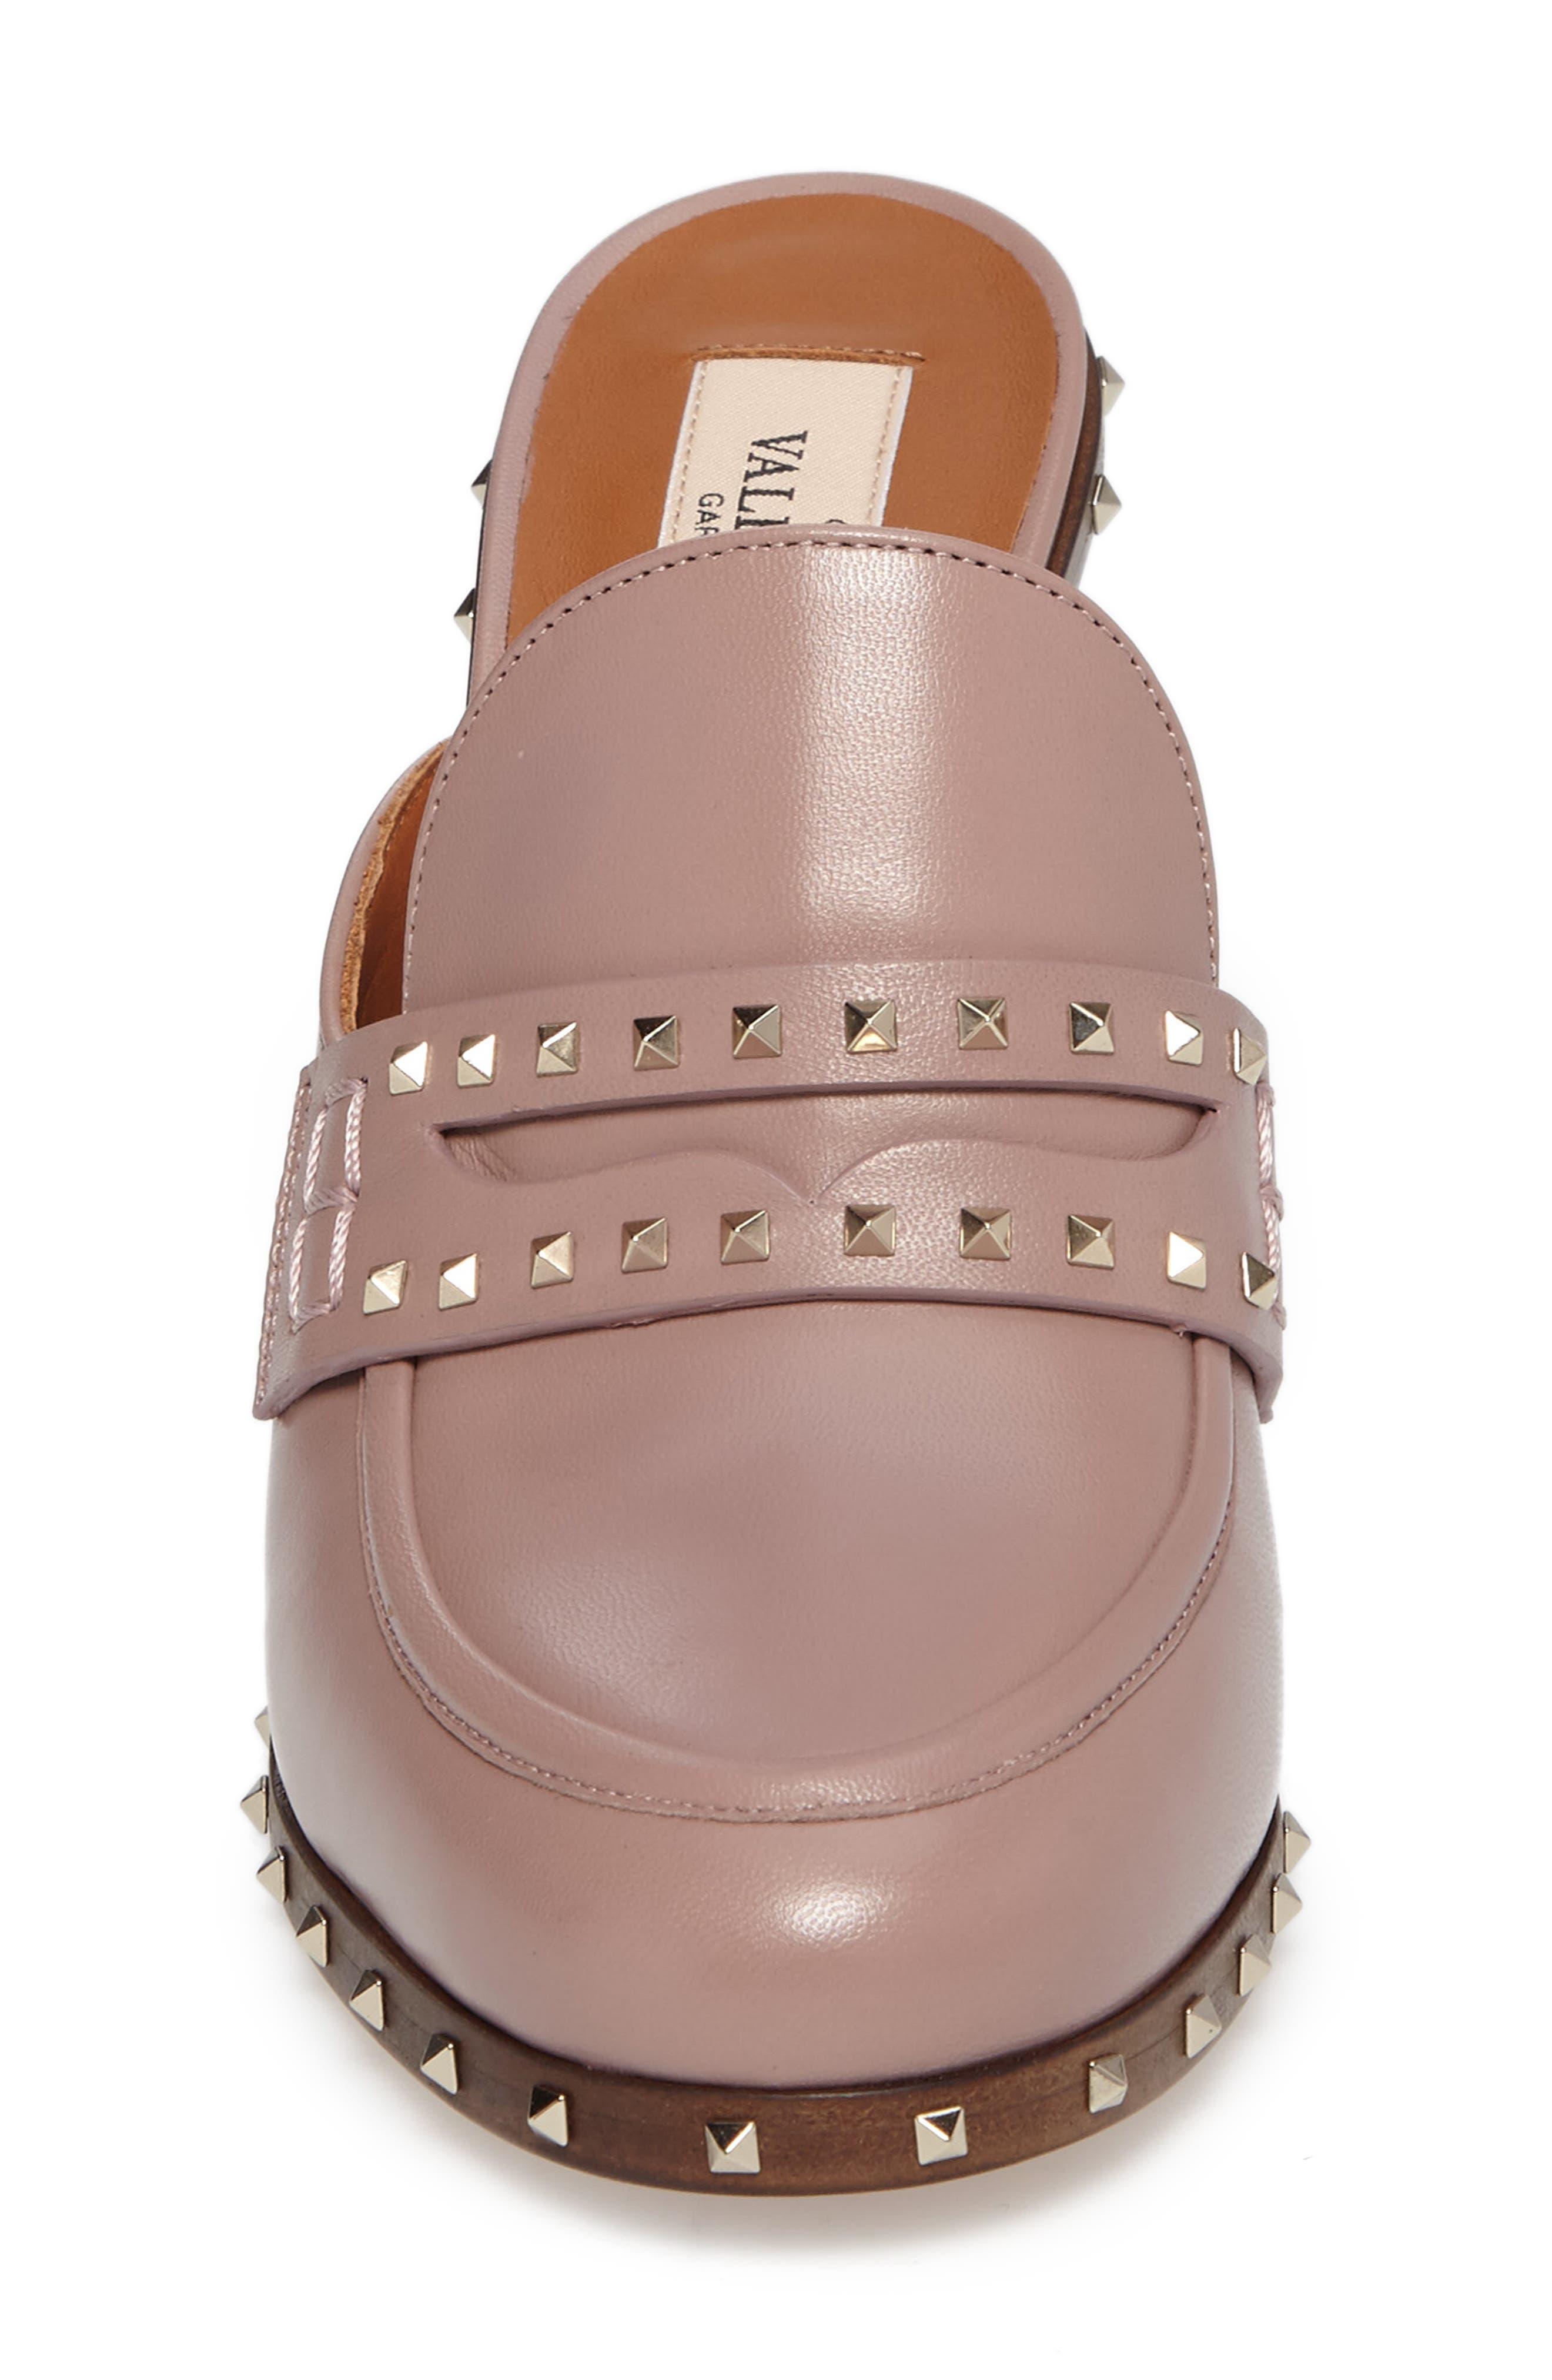 Rockstud Loafer Mule,                             Alternate thumbnail 4, color,                             Pink Leather